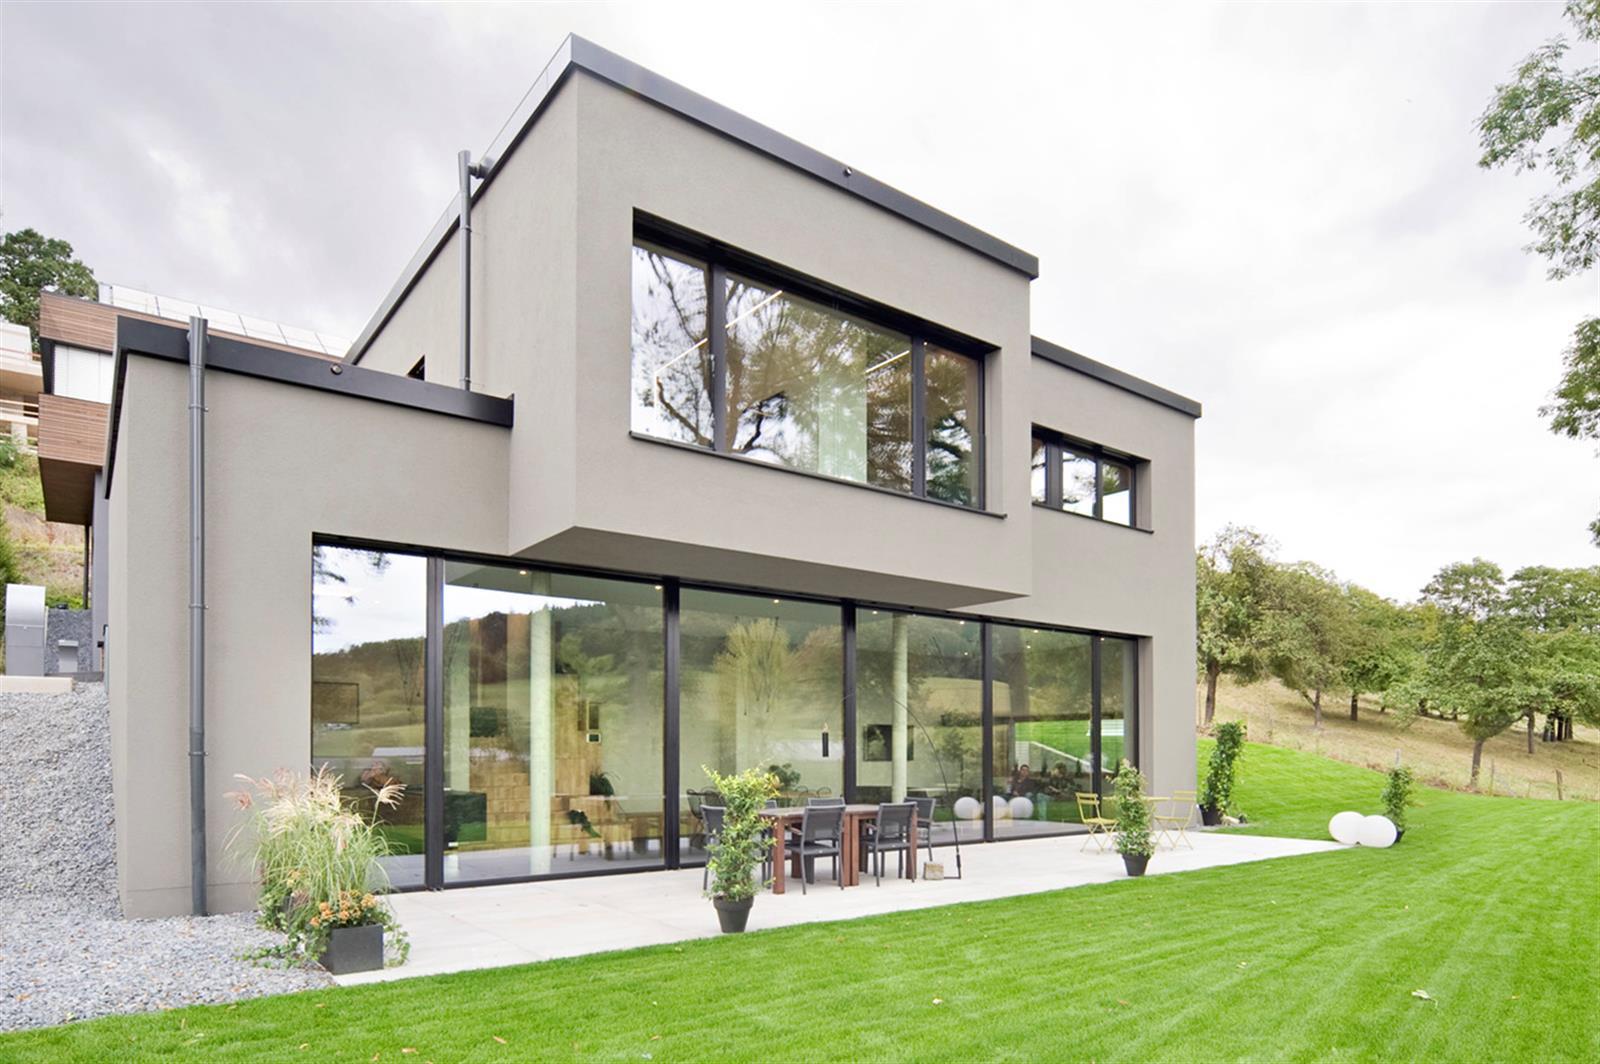 Association n arend c fischbach sa construction for Association maison